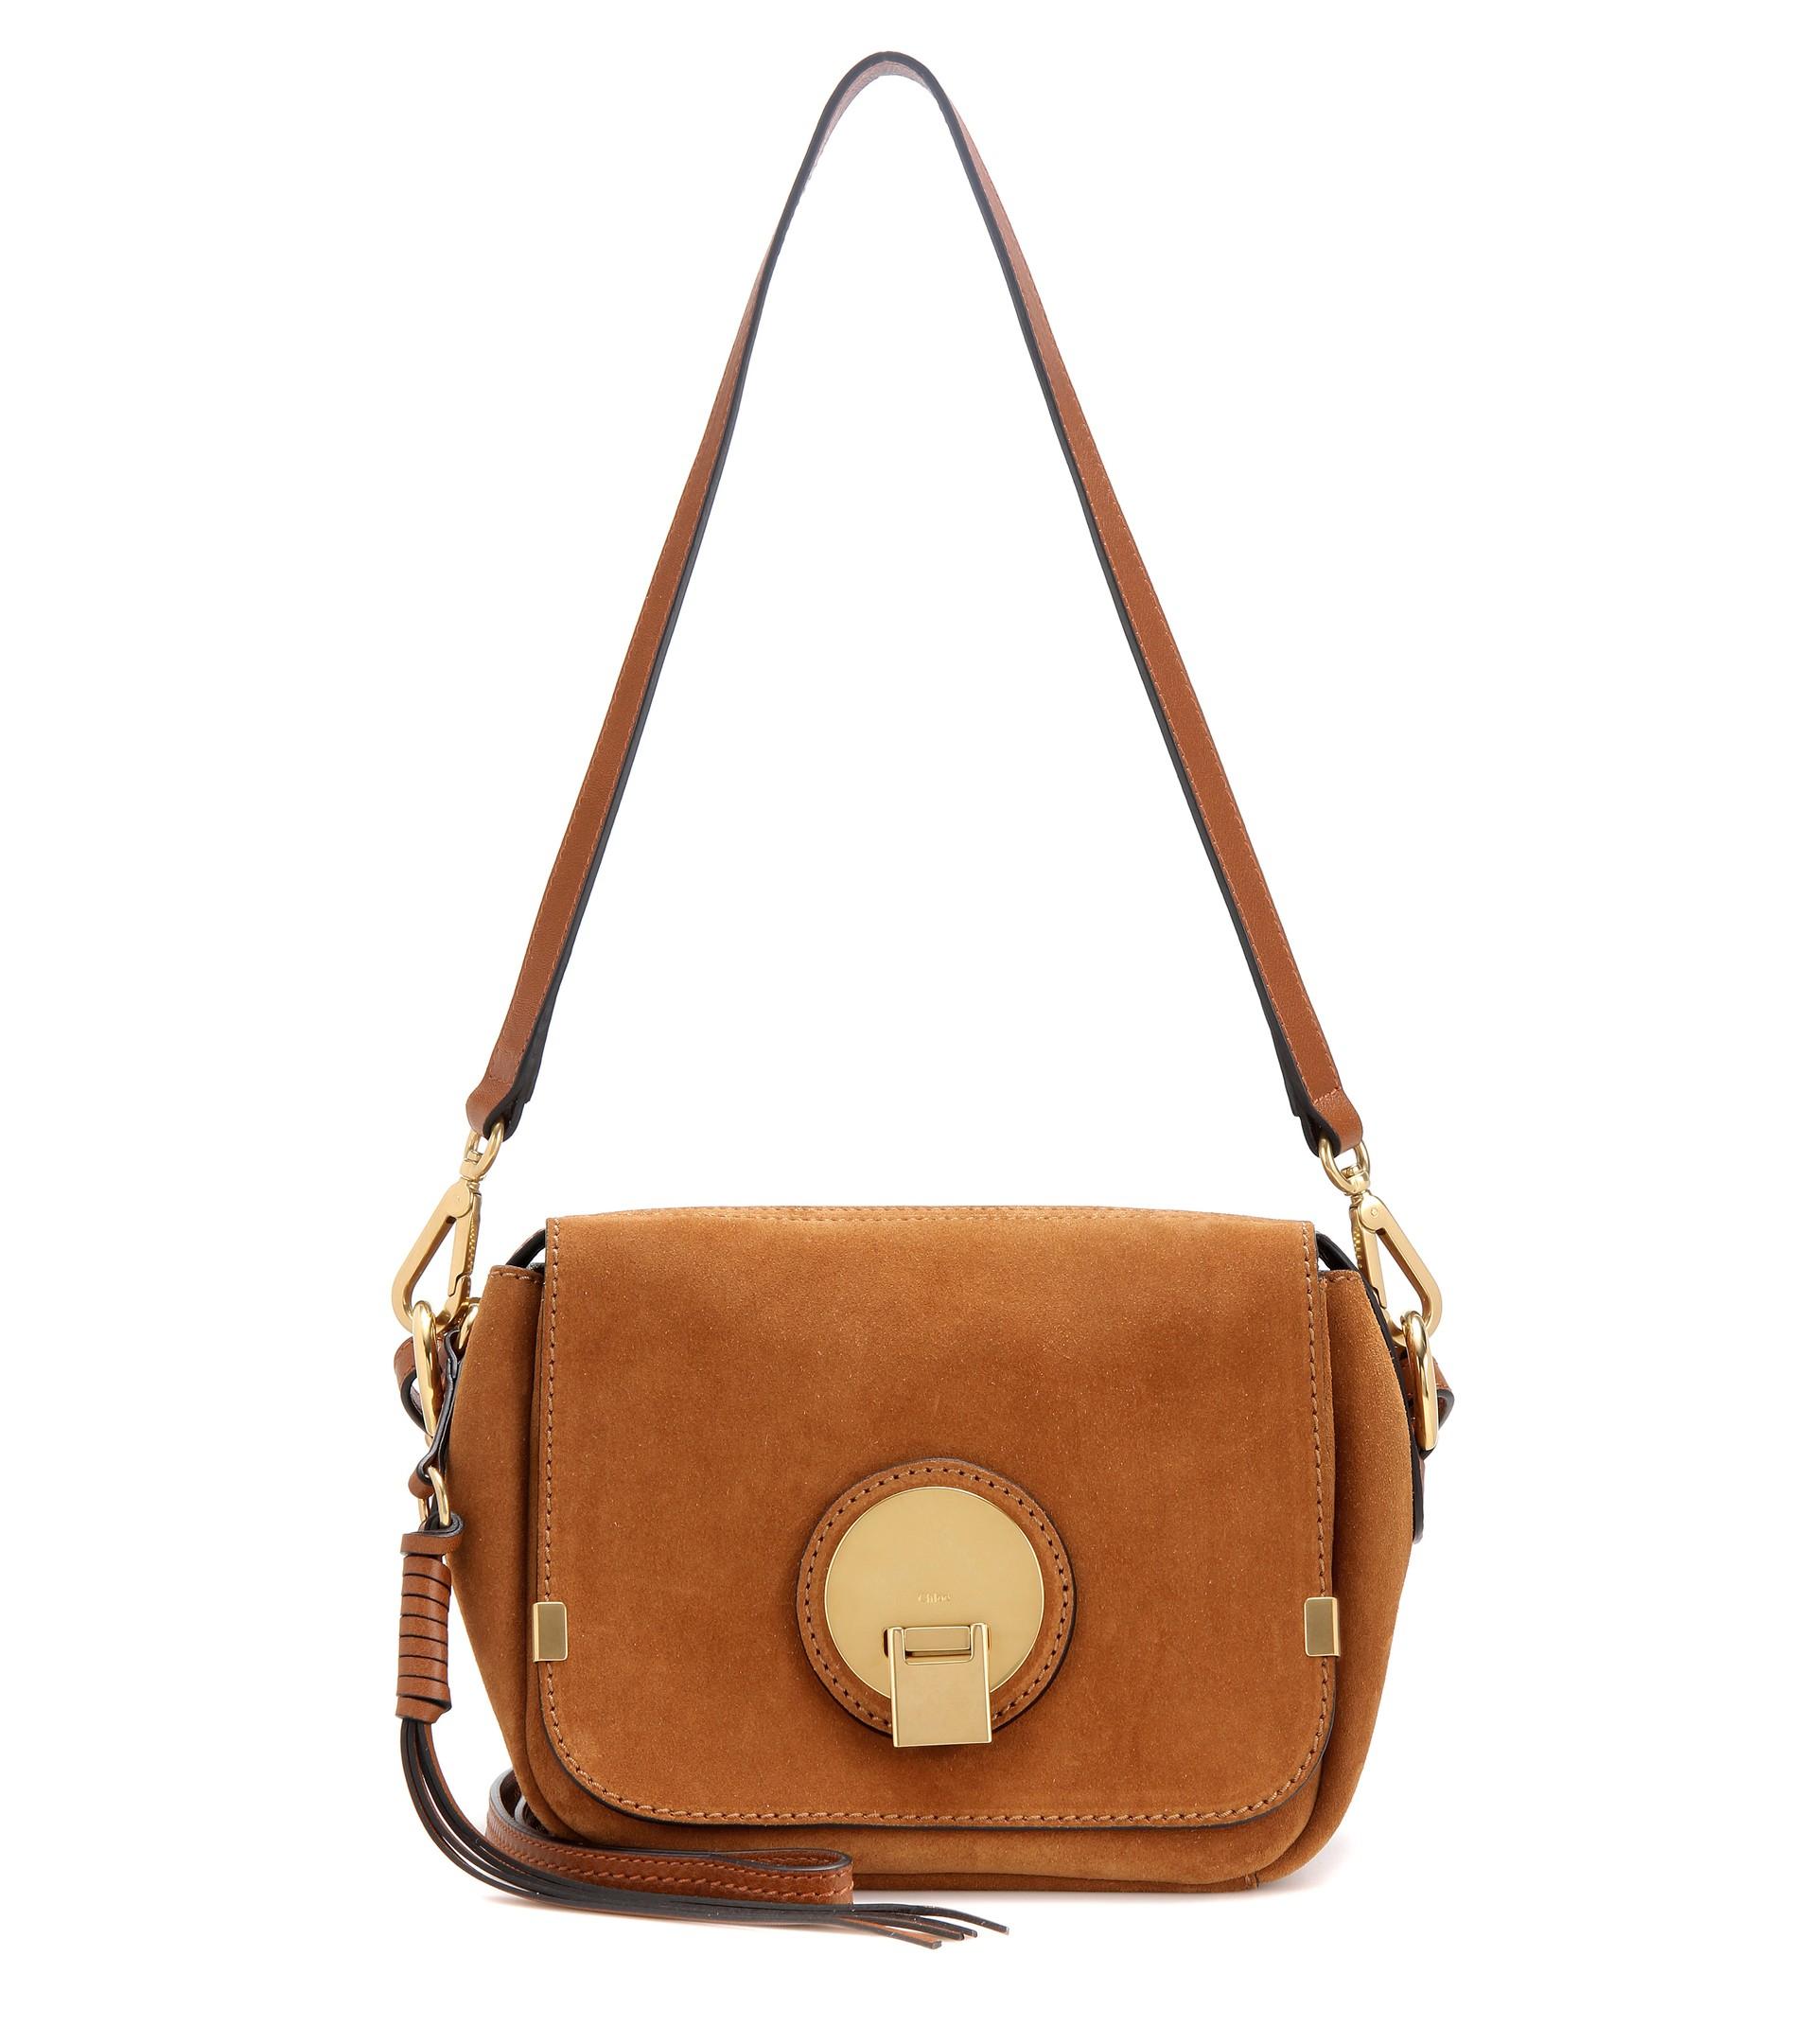 Chlo�� Indy Camera Bag Suede Shoulder Bag in Brown   Lyst